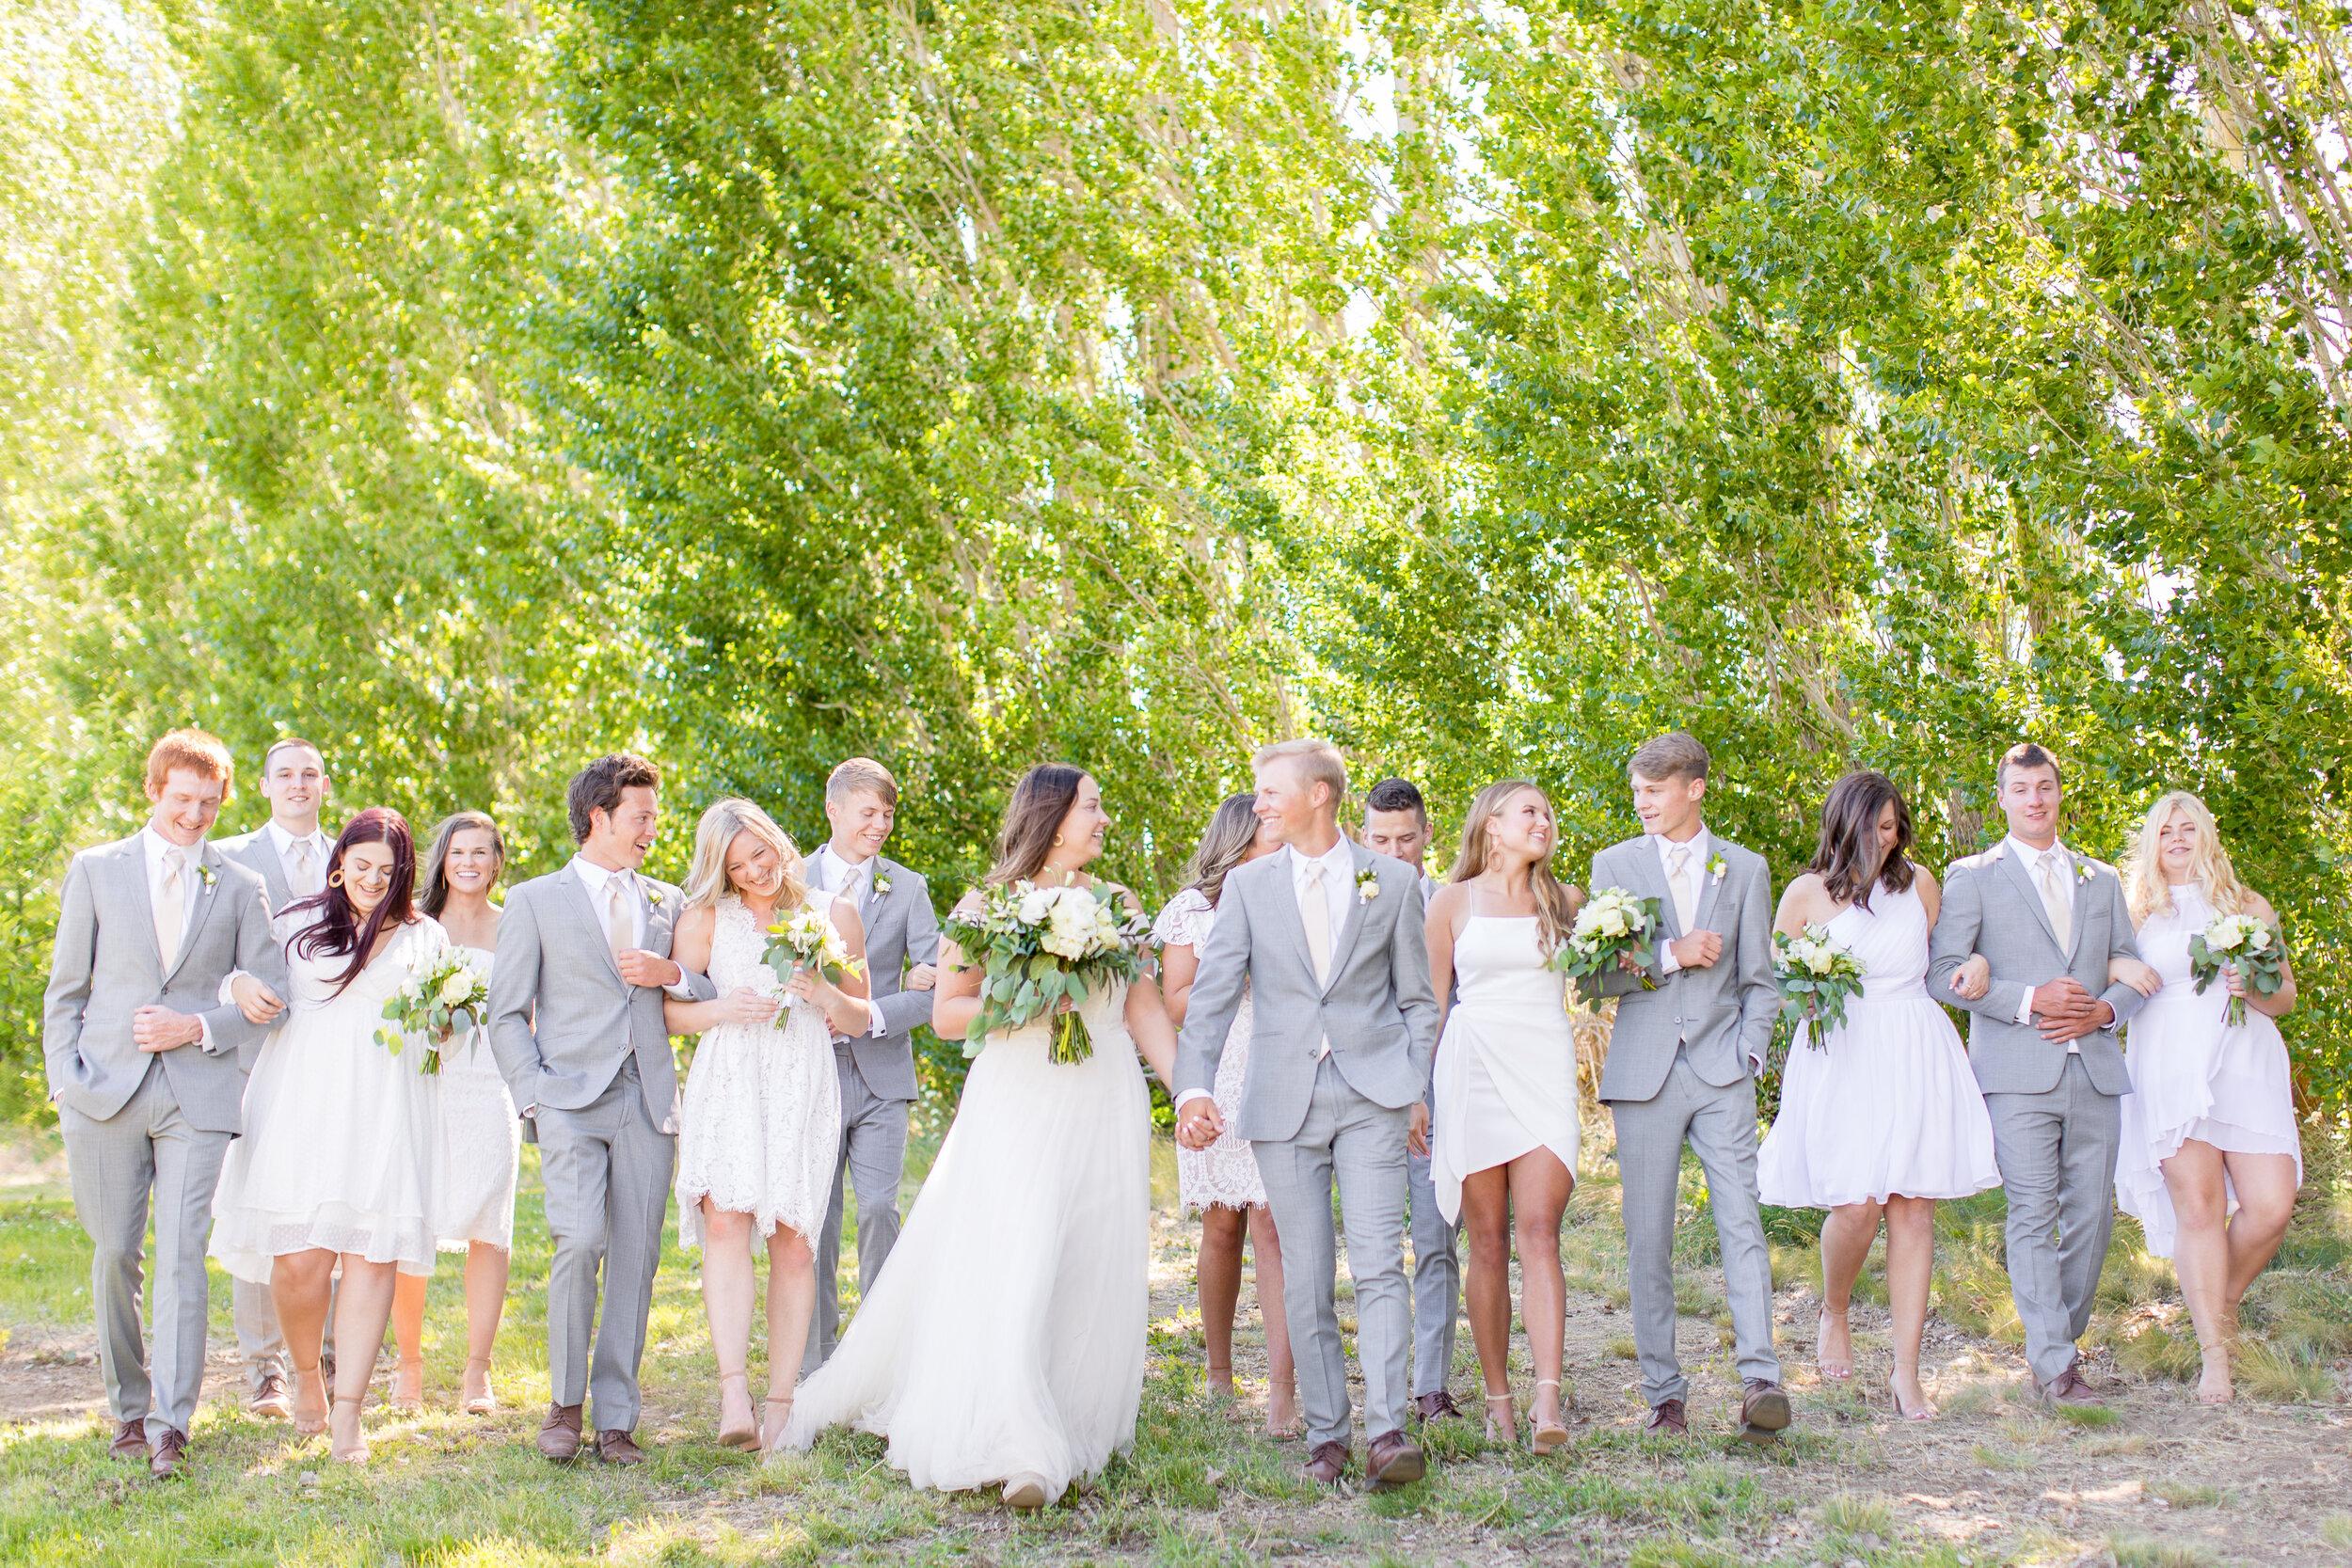 wedding party spokane bride and groom